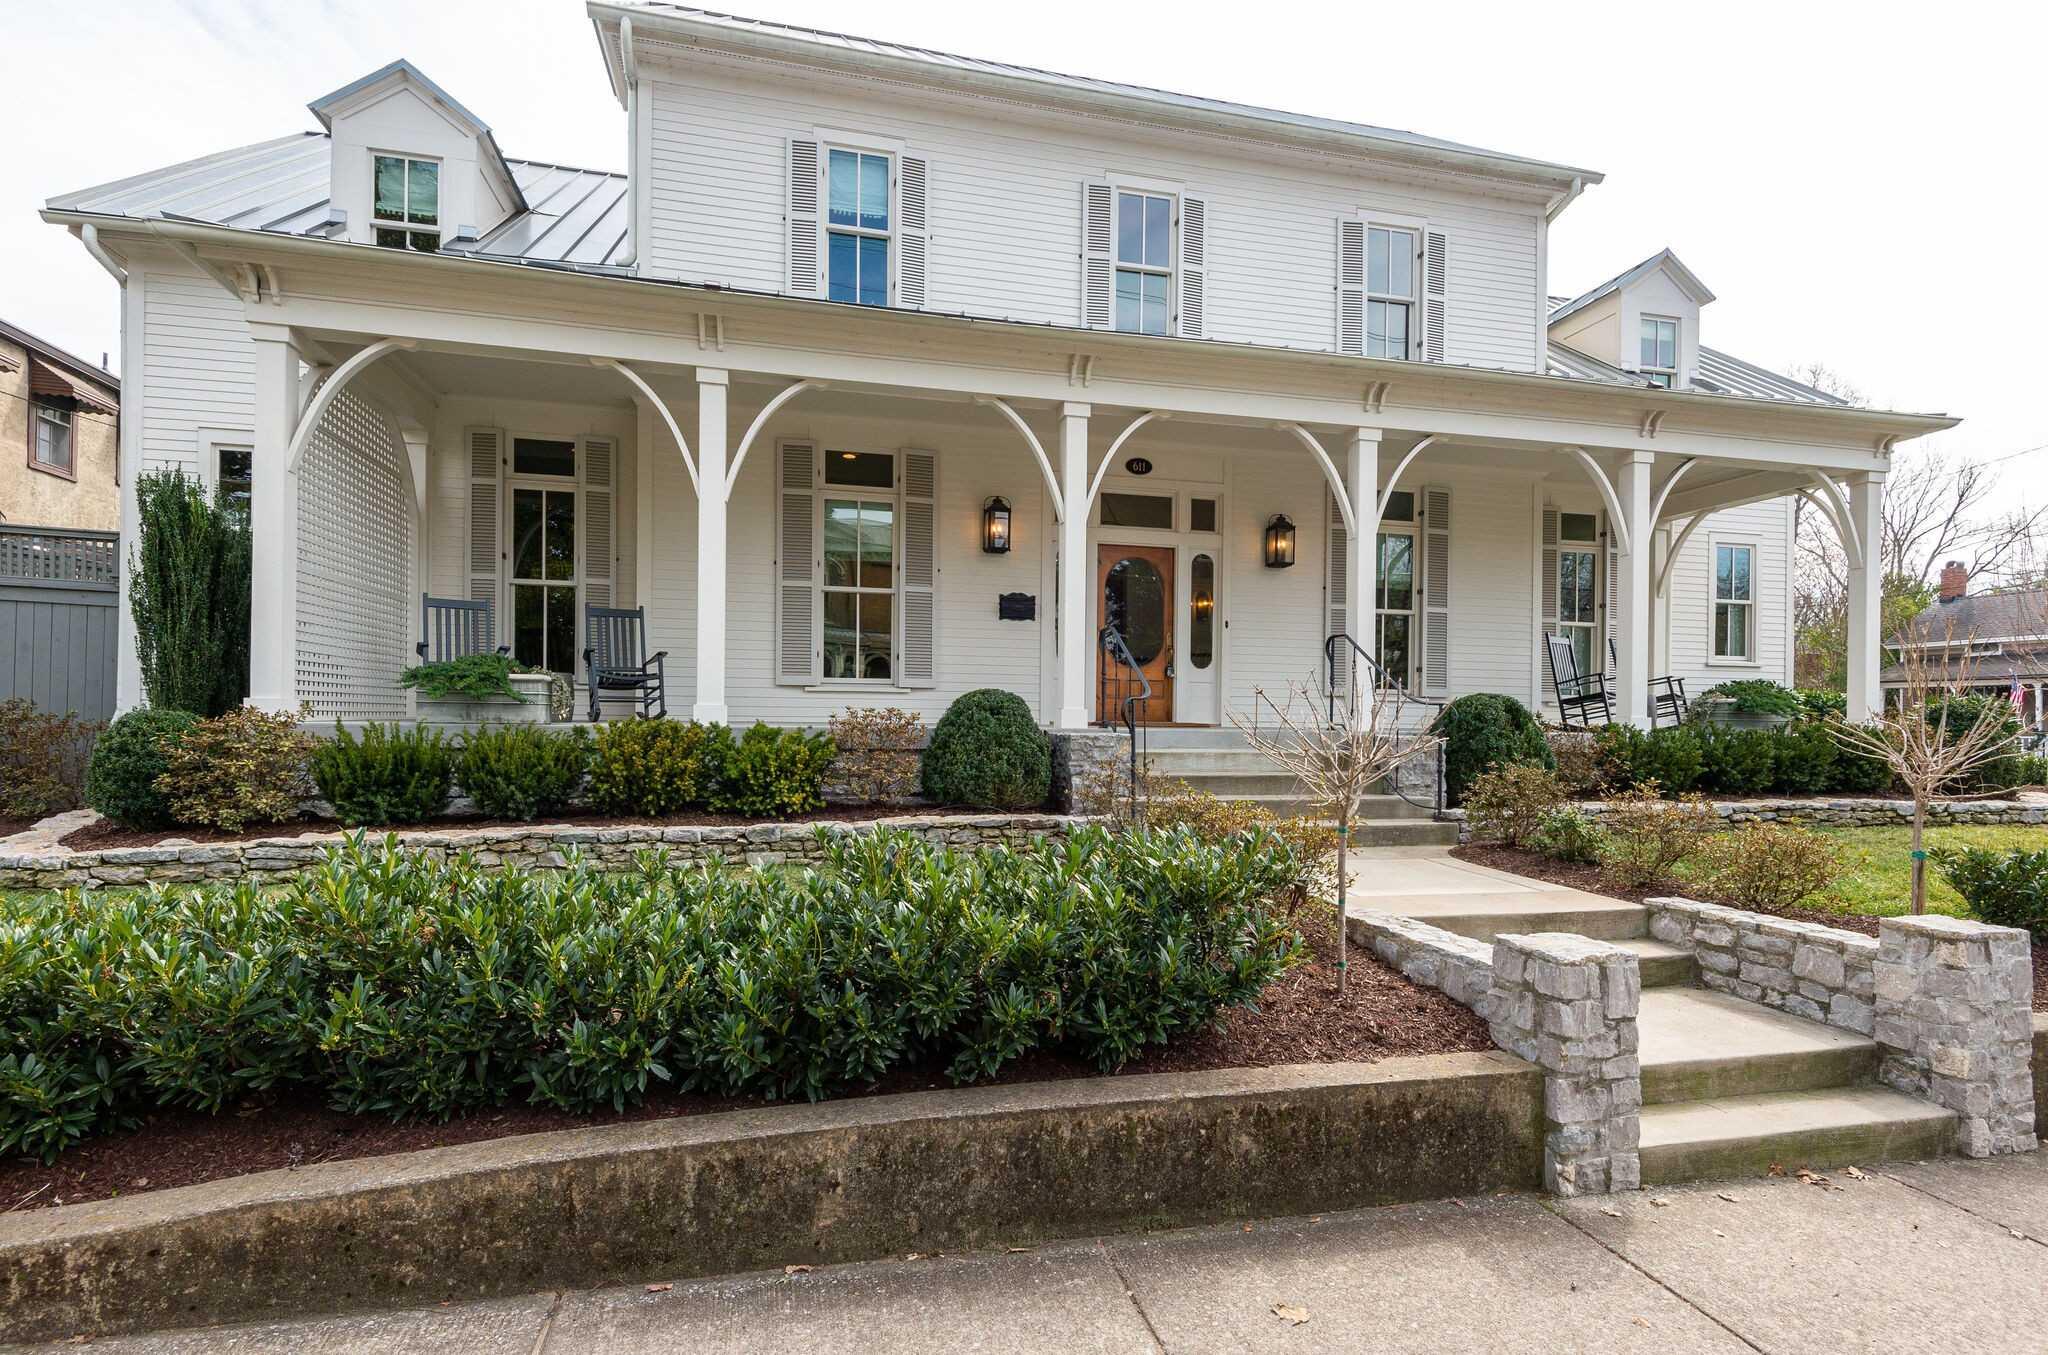 $3,200,000 - 6Br/7Ba -  for Sale in Hincheyville, Franklin